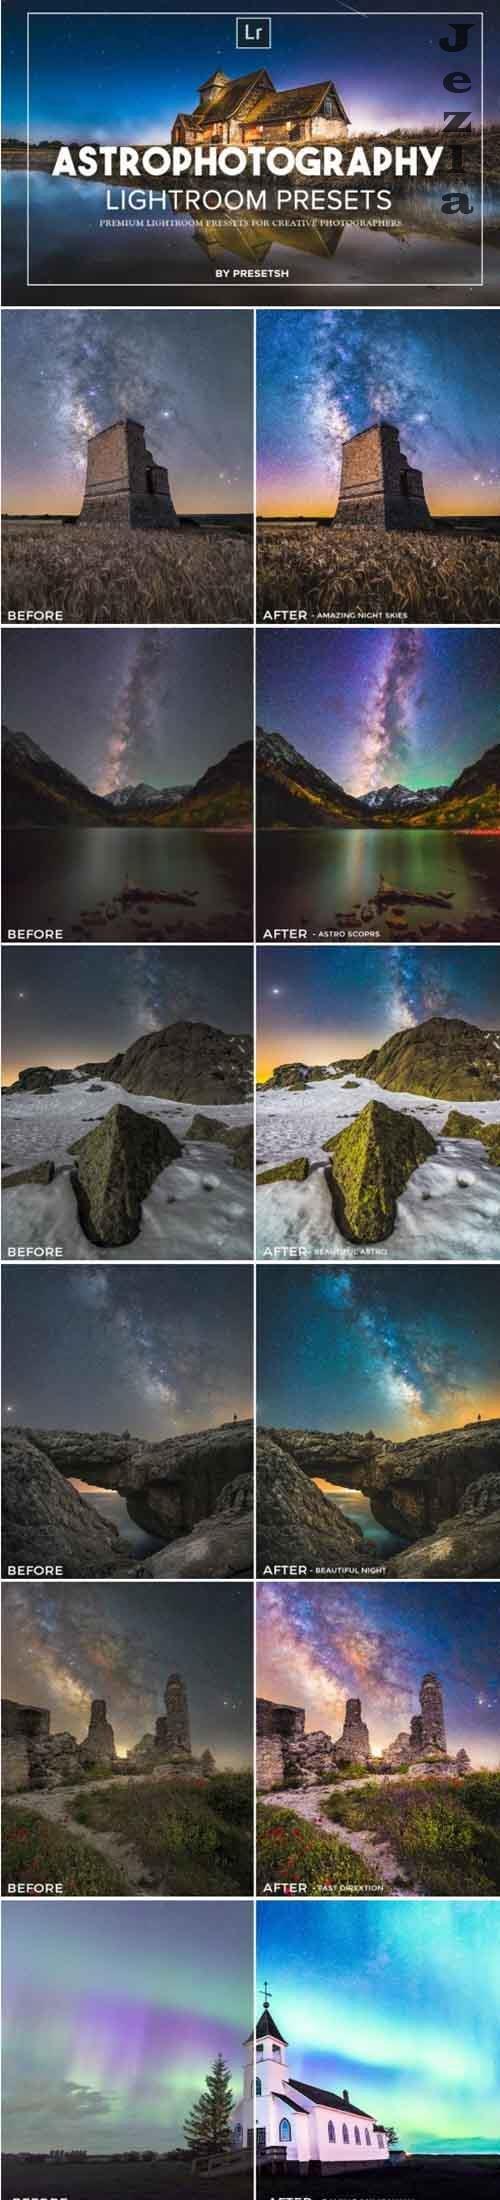 Astro Photography LRM Presets 4843397